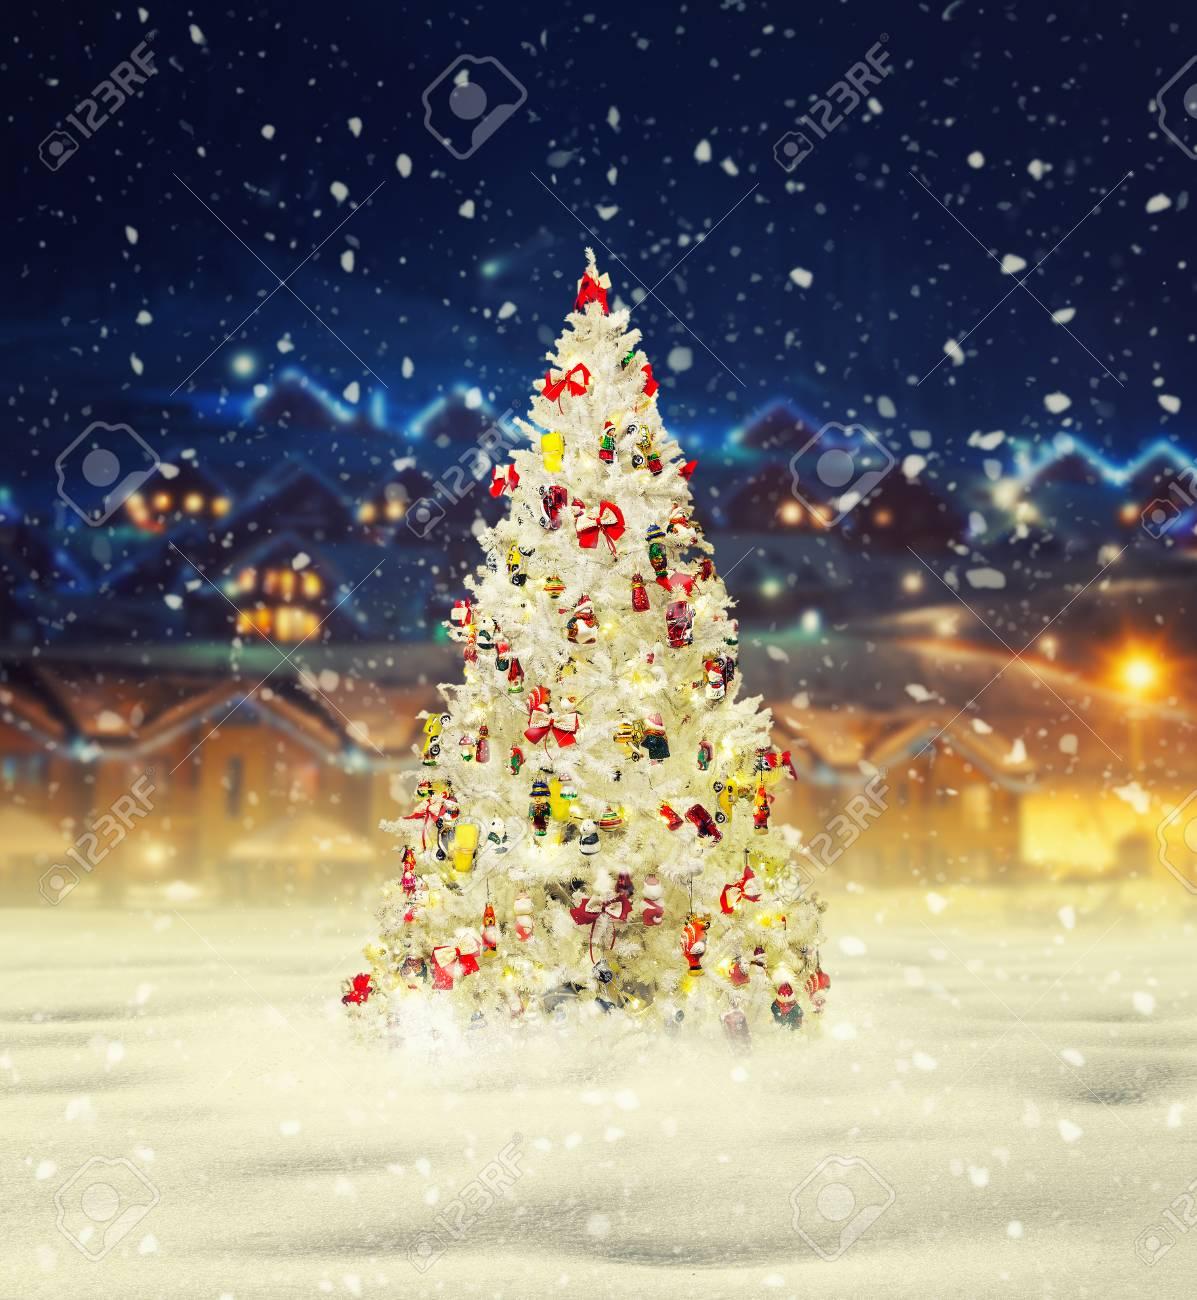 Snowy Christmas.Merry Christmas Snowy Xmas Tree With Decoration